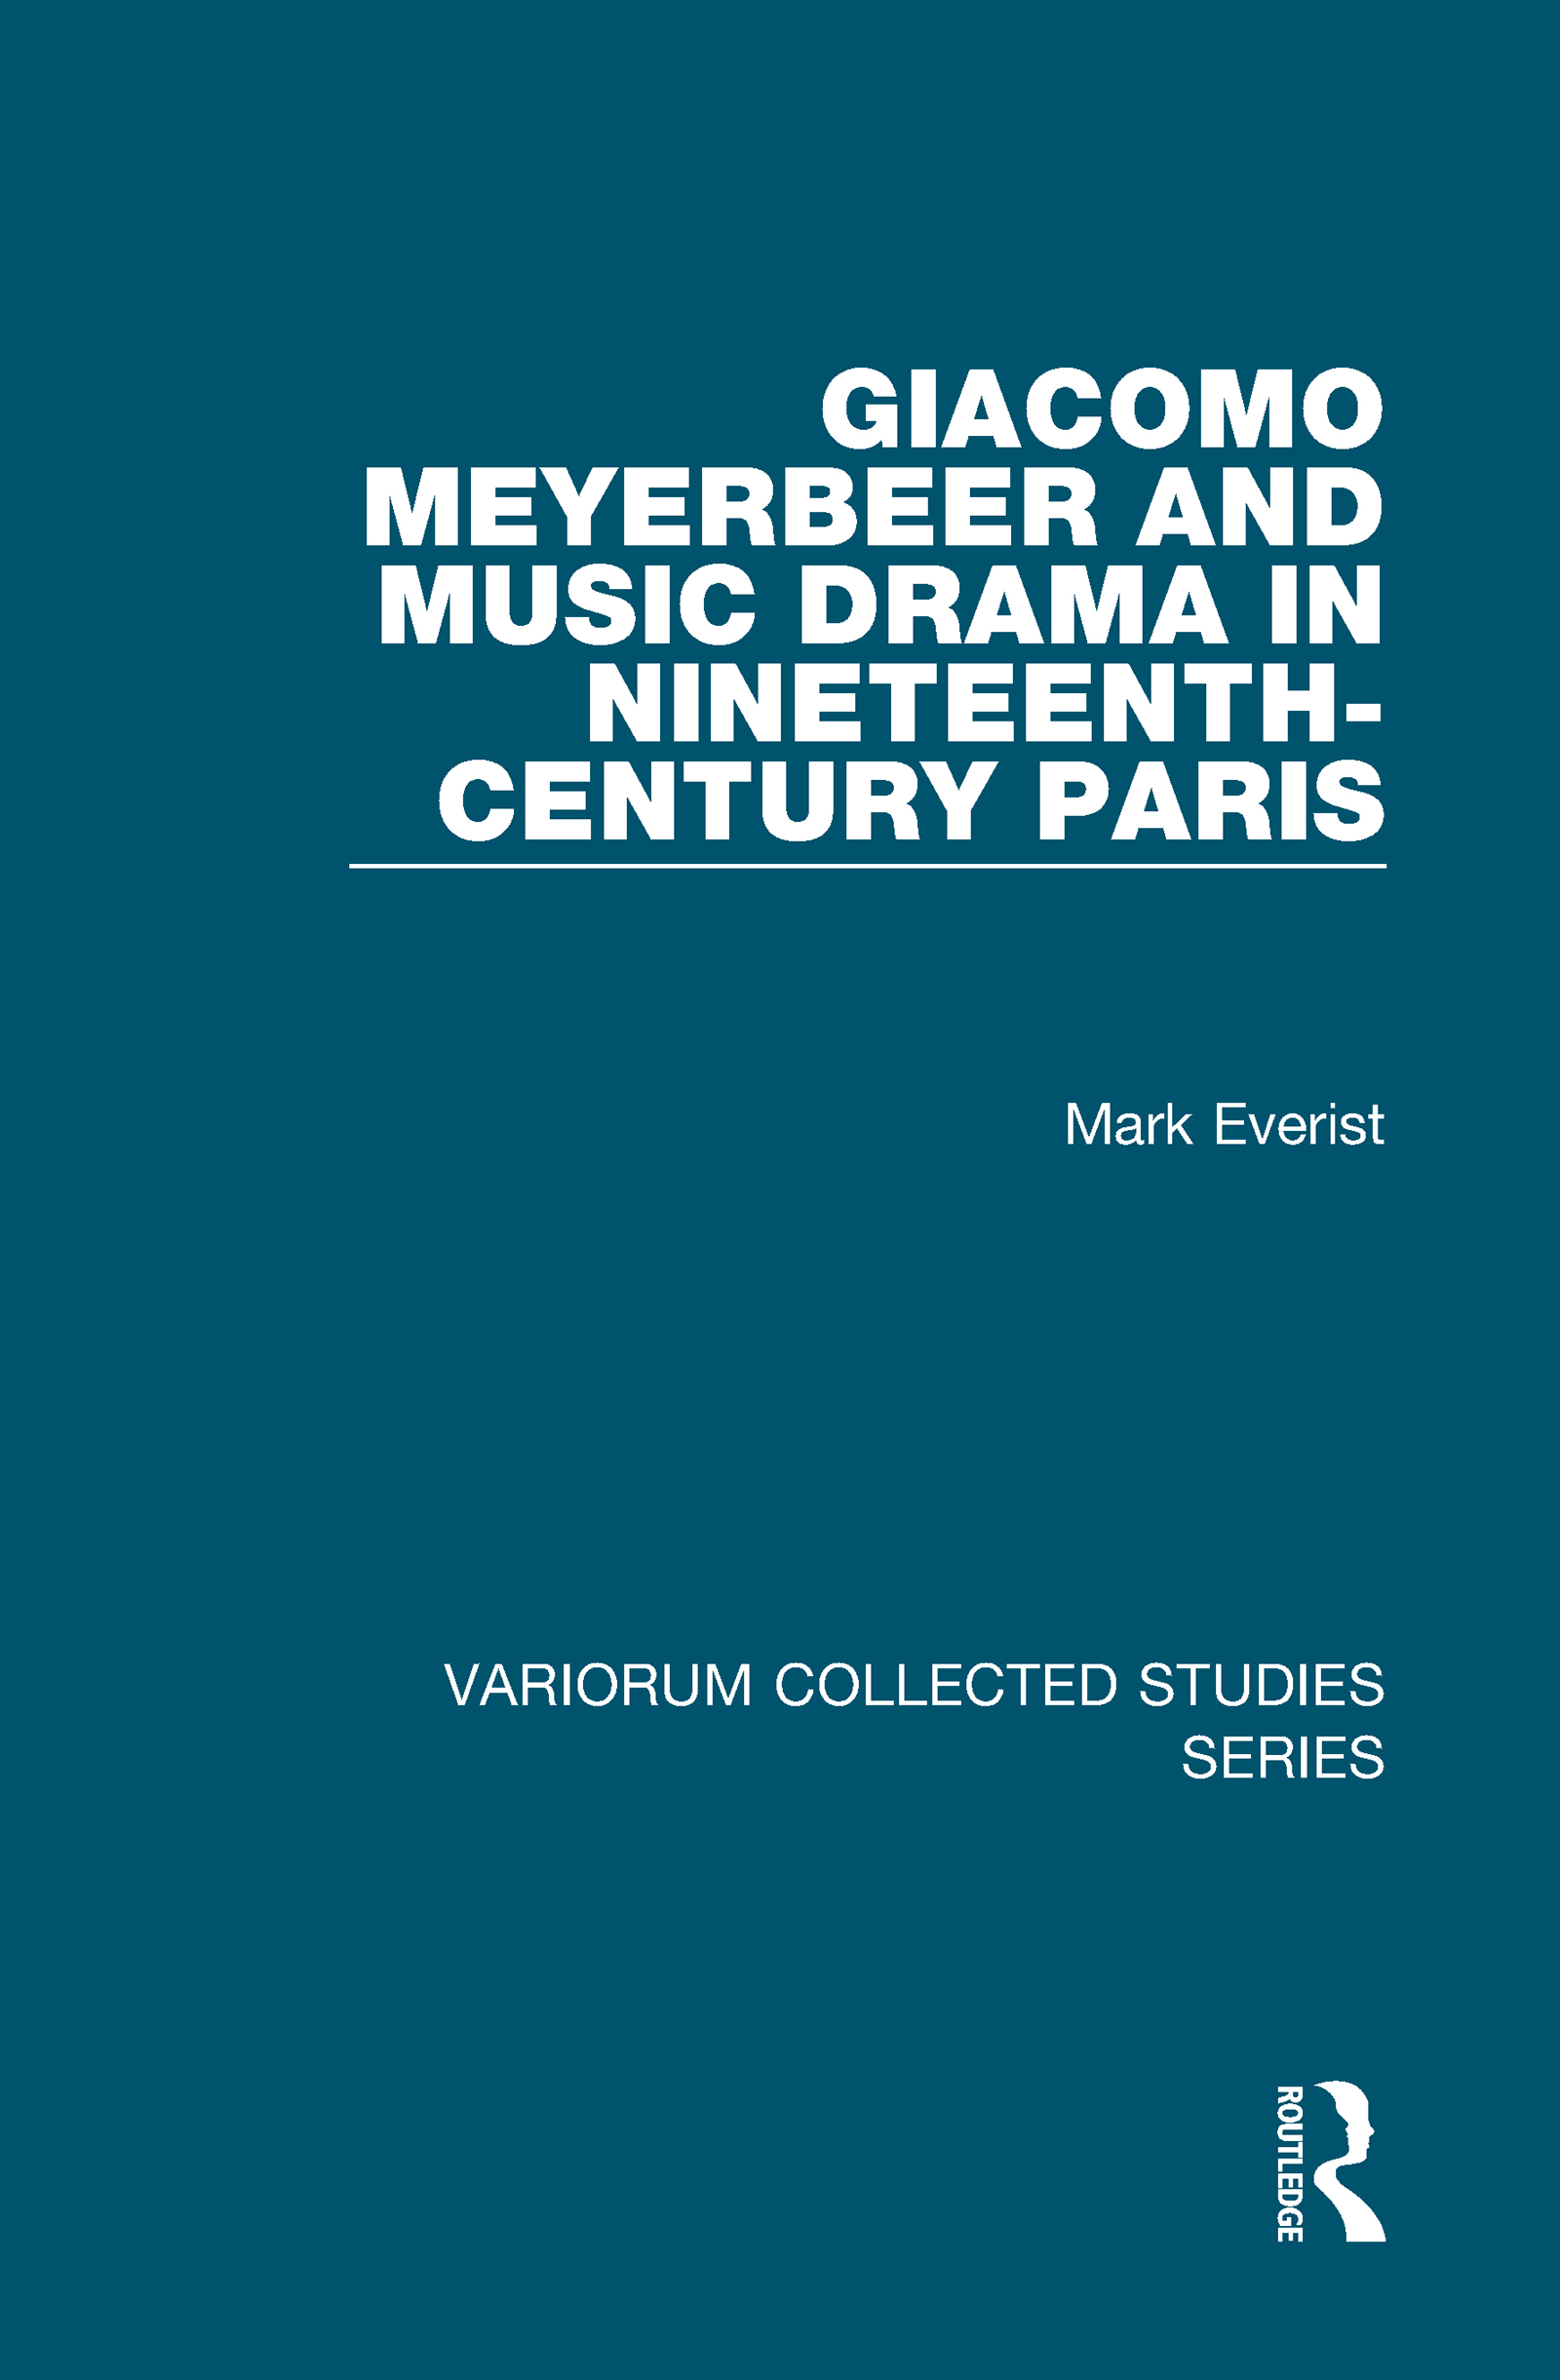 Giacomo Meyerbeer and Music Drama in Nineteenth-Century Paris